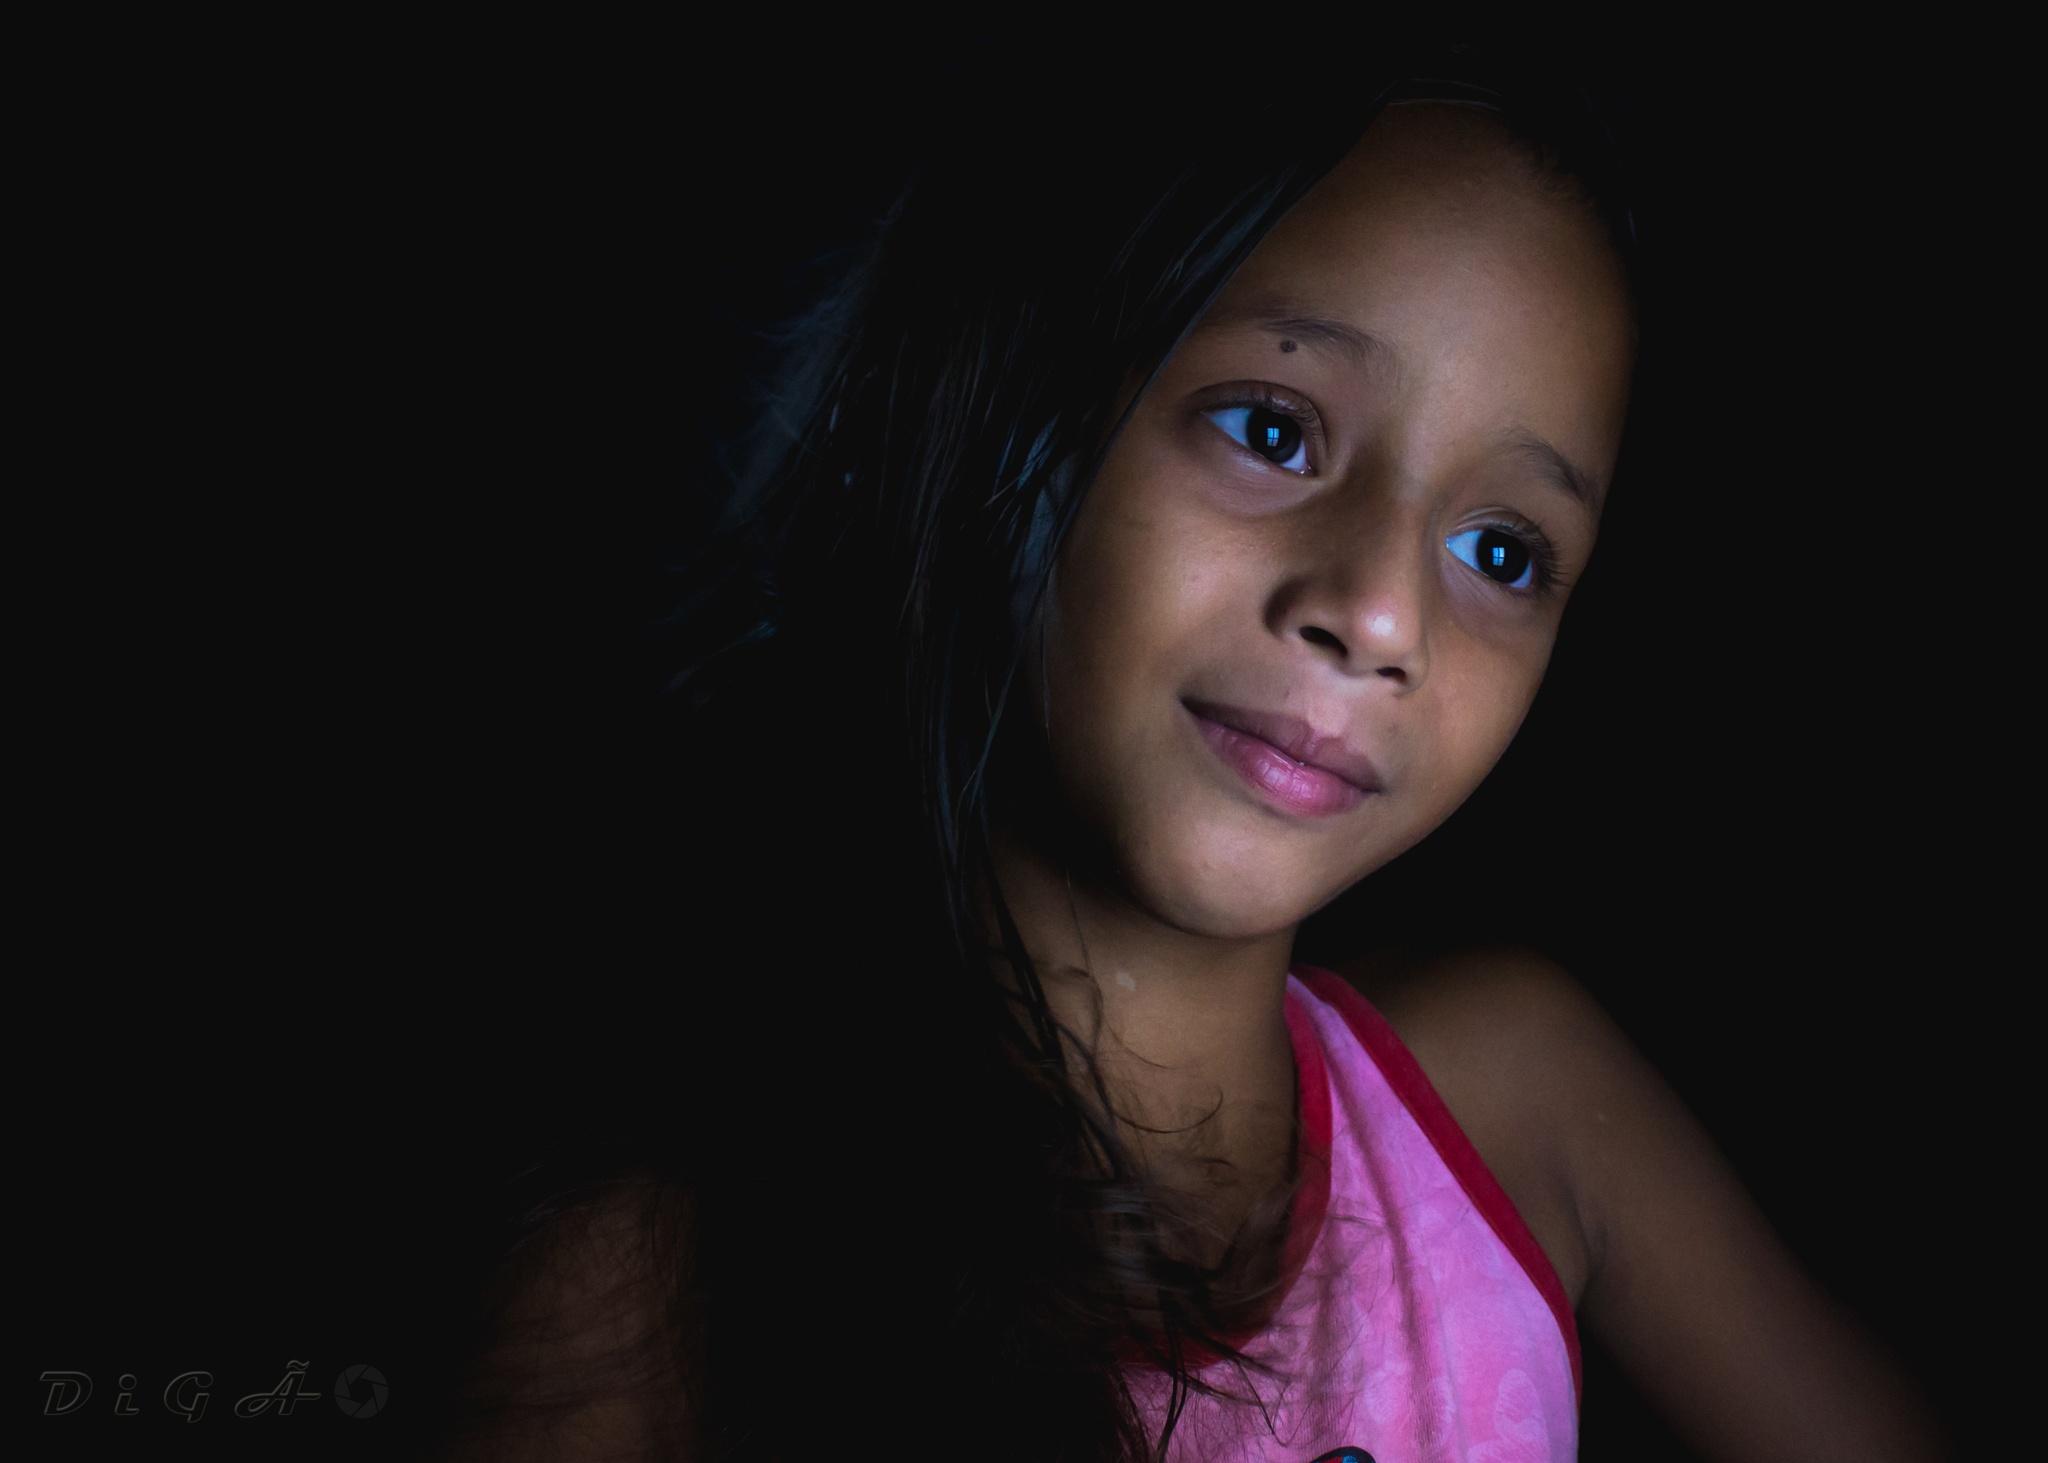 Eyes by Digão Saldanha